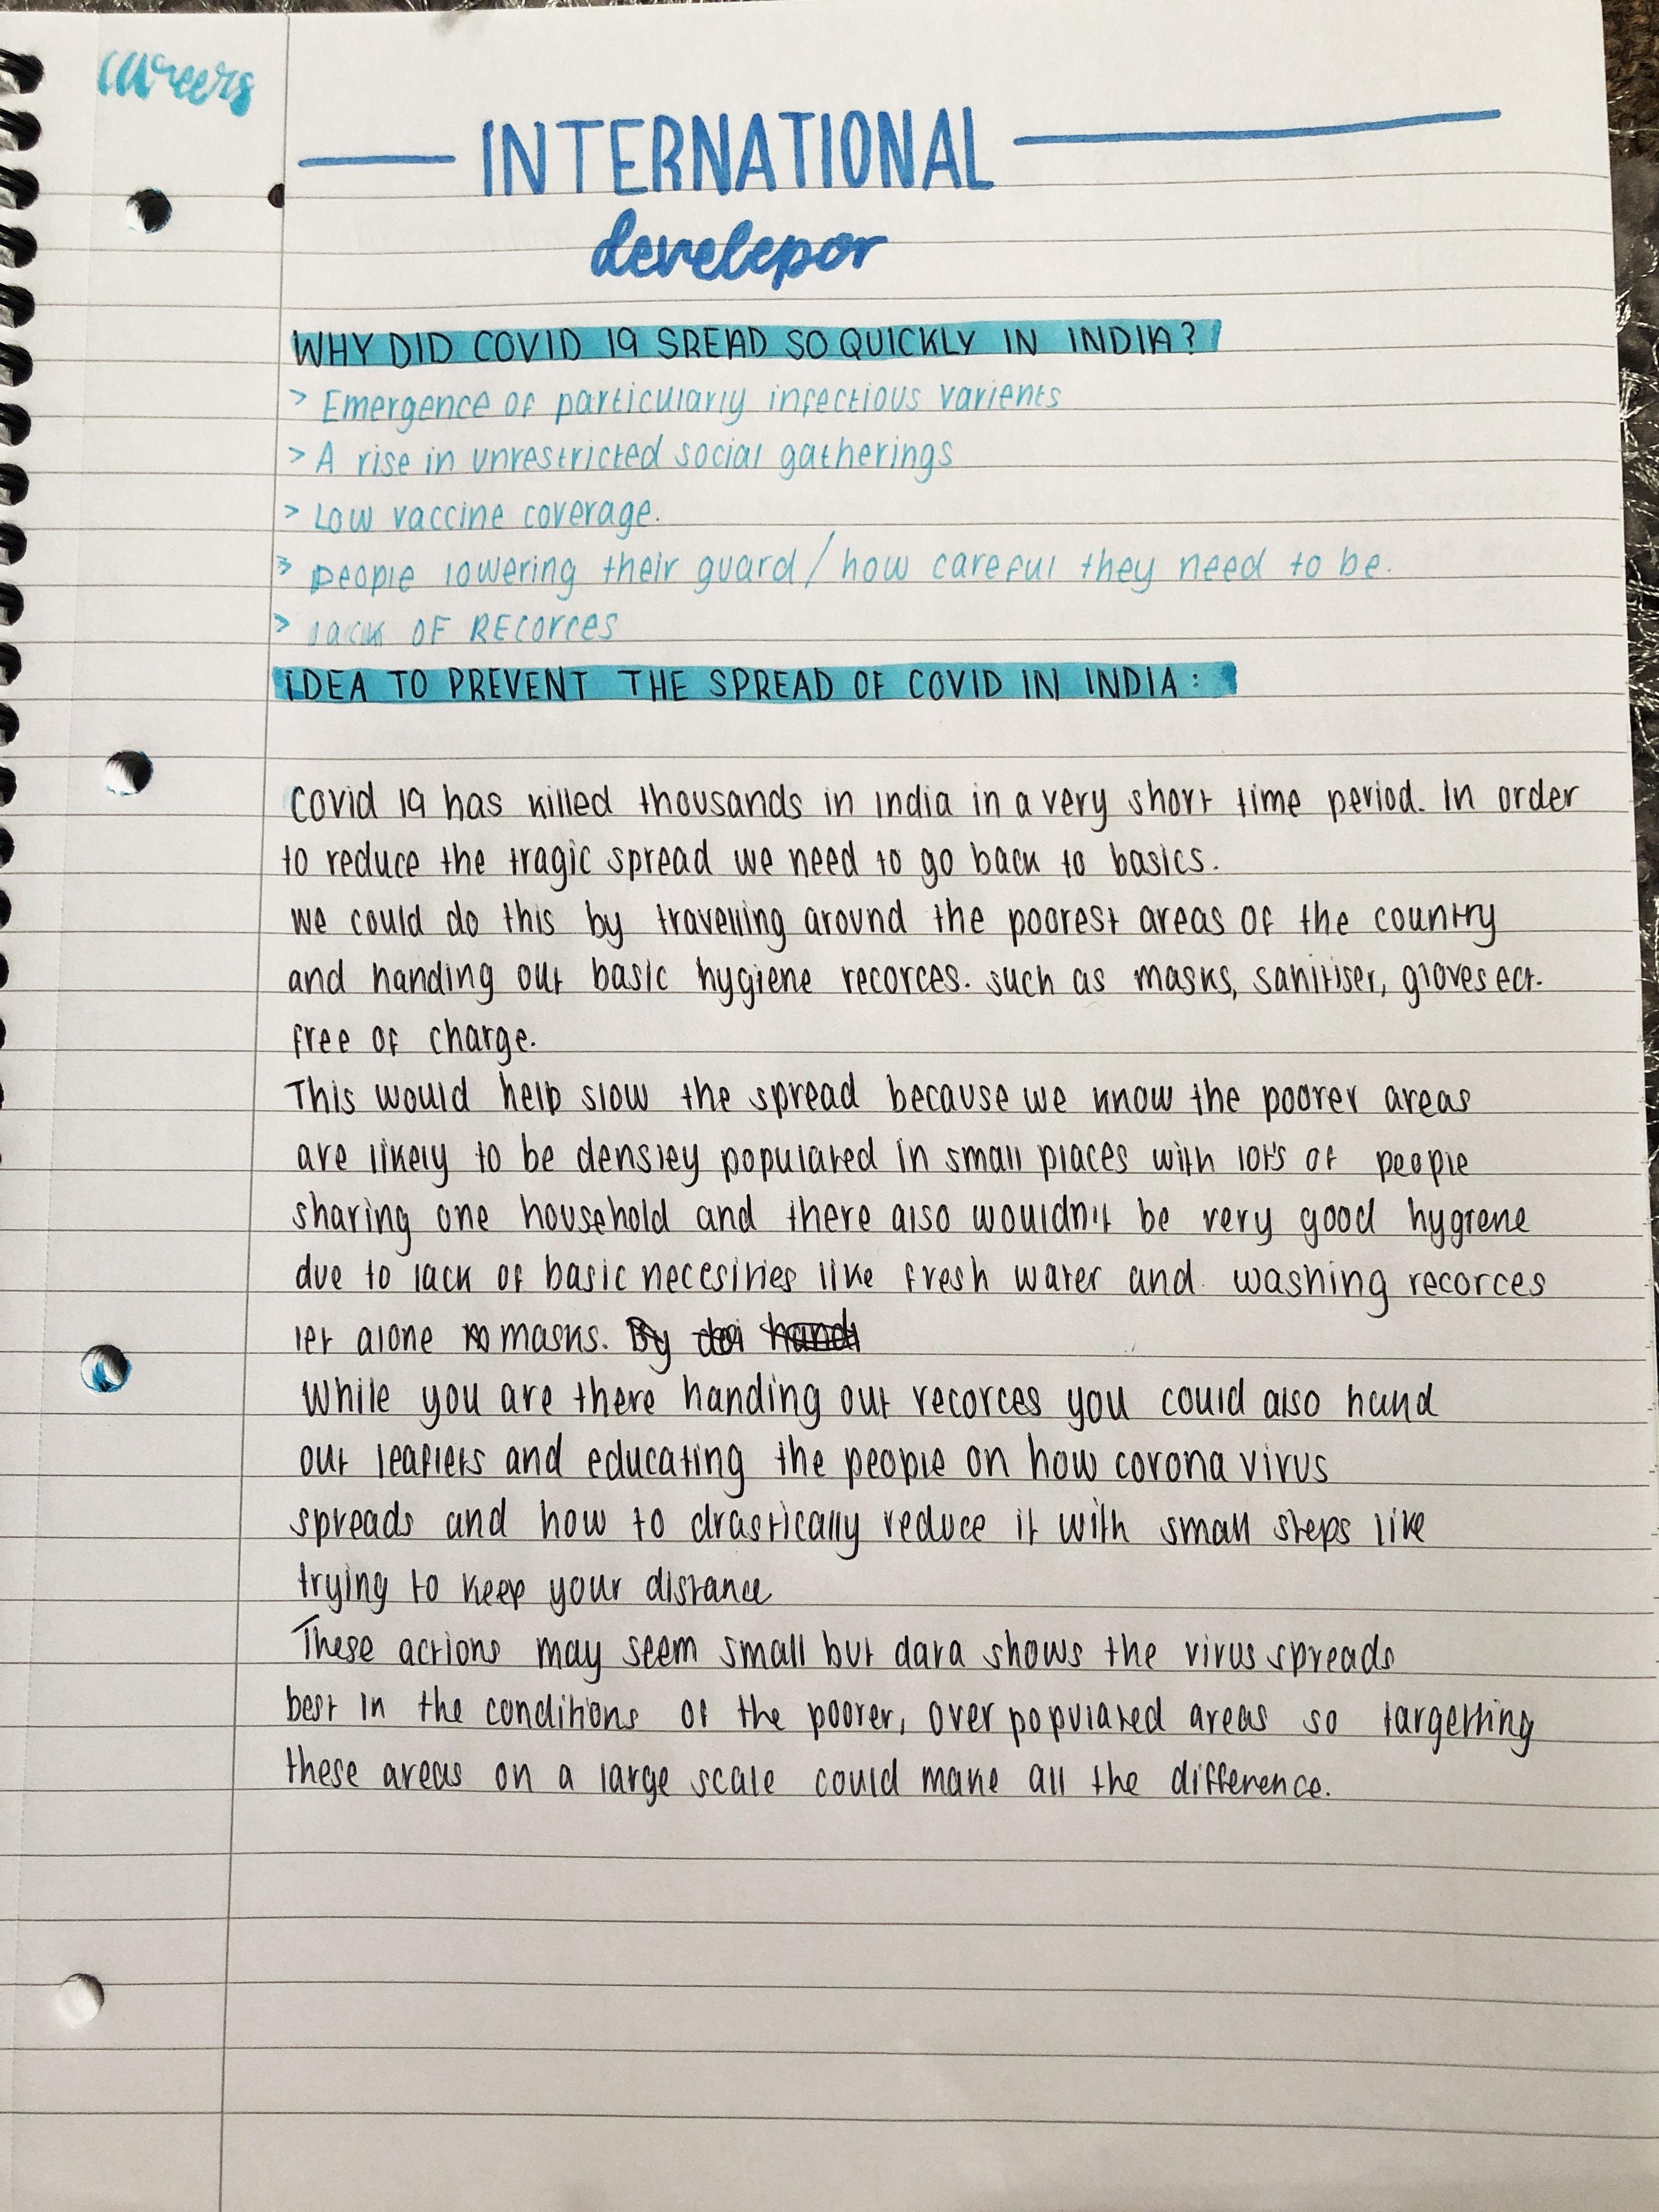 Essay on international development by a student from Sir John Leman